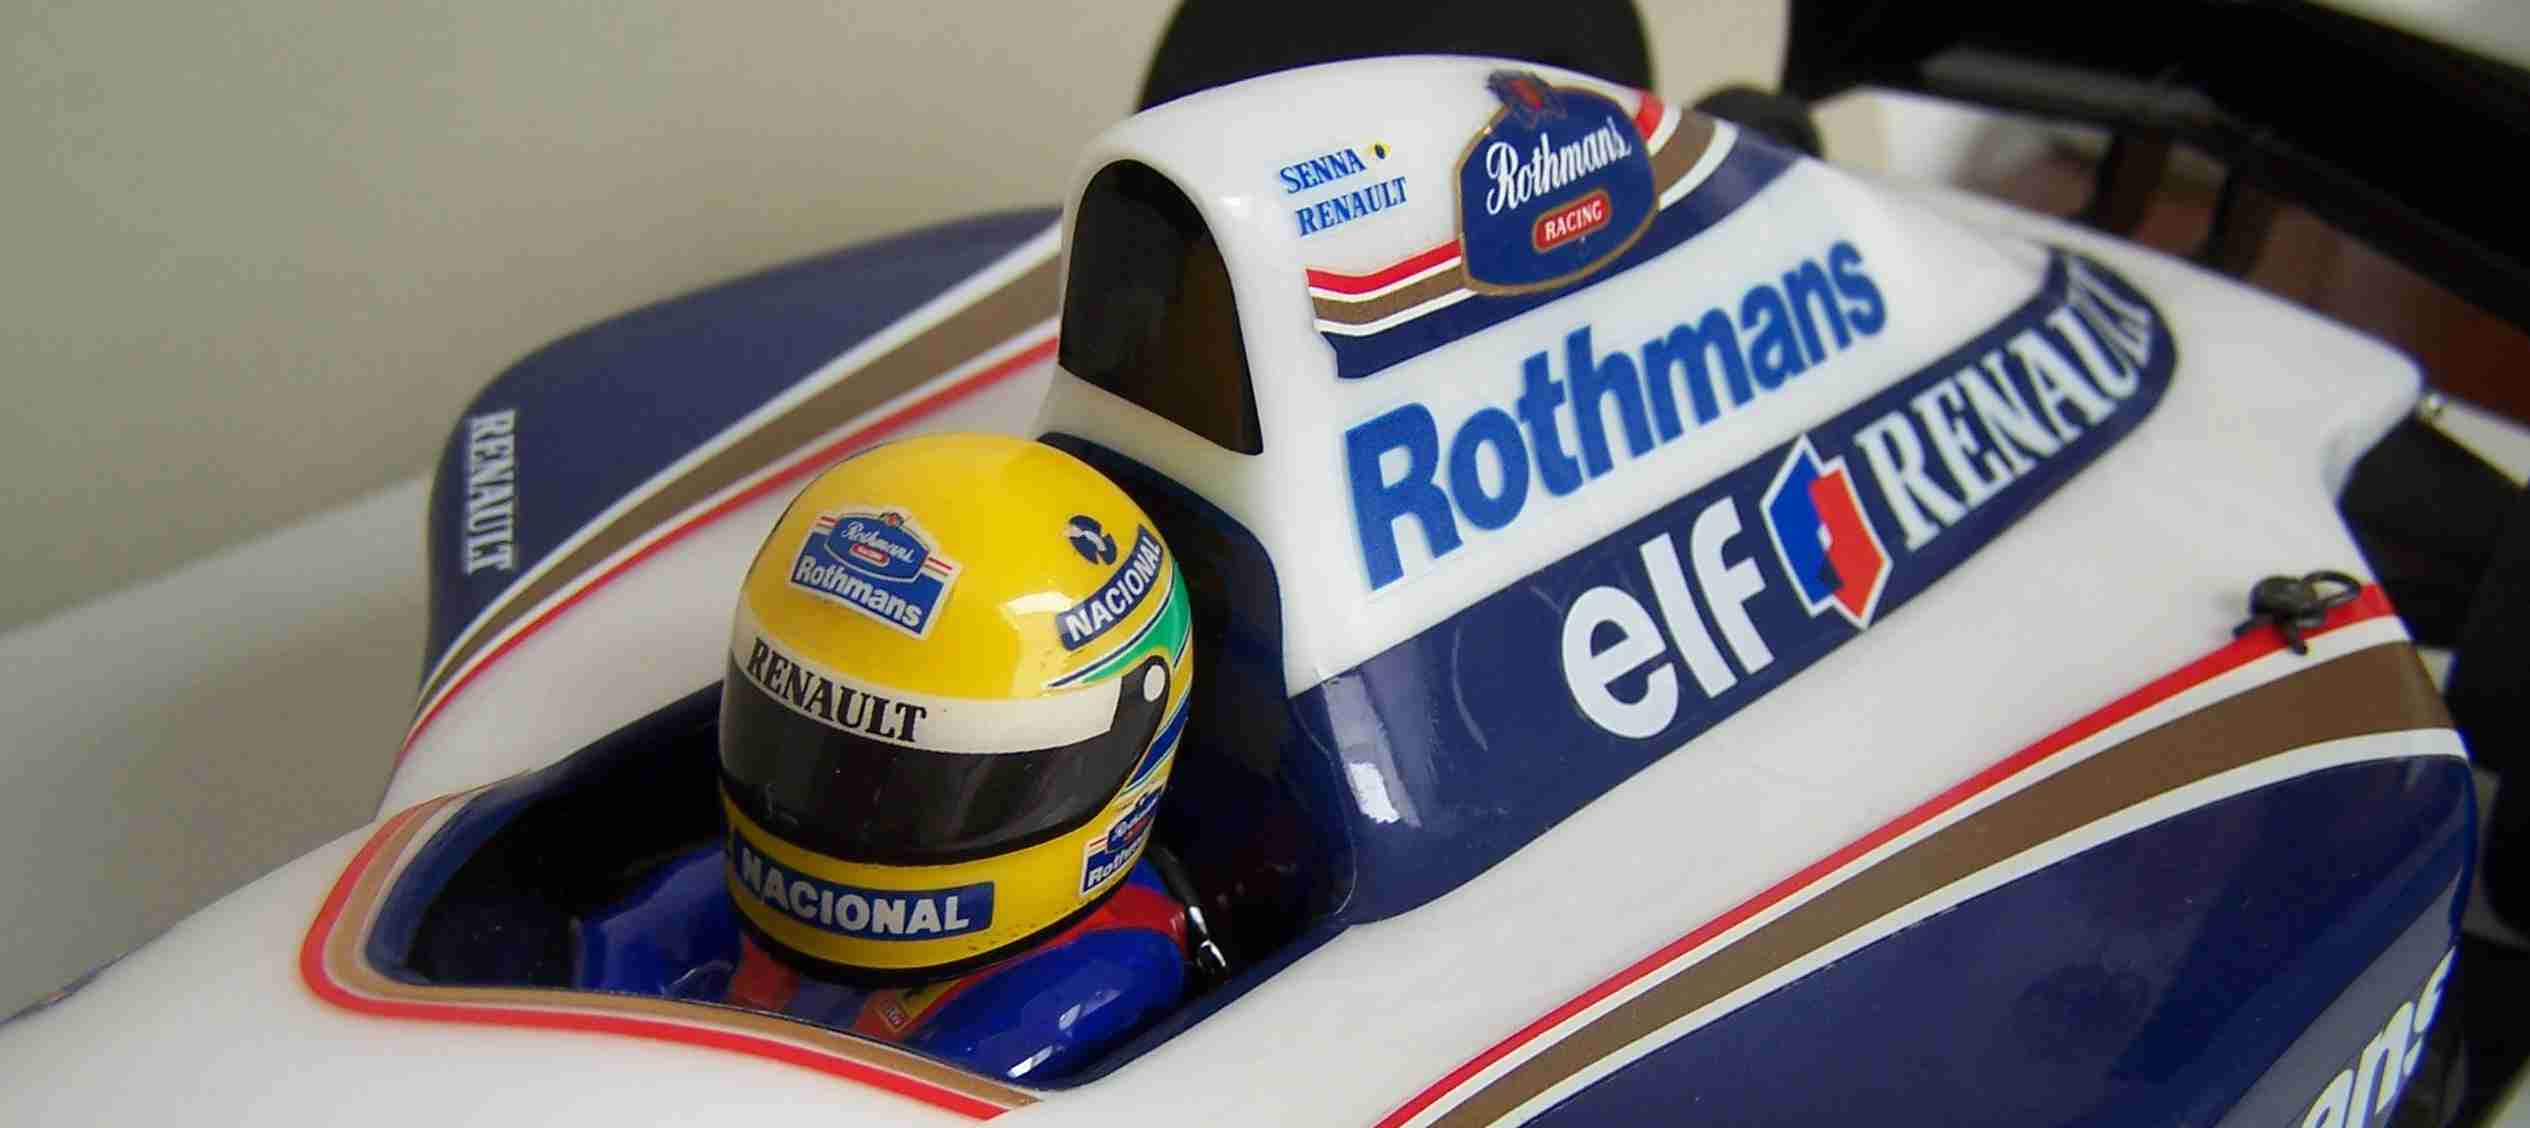 Tamiya Formel 1 RC